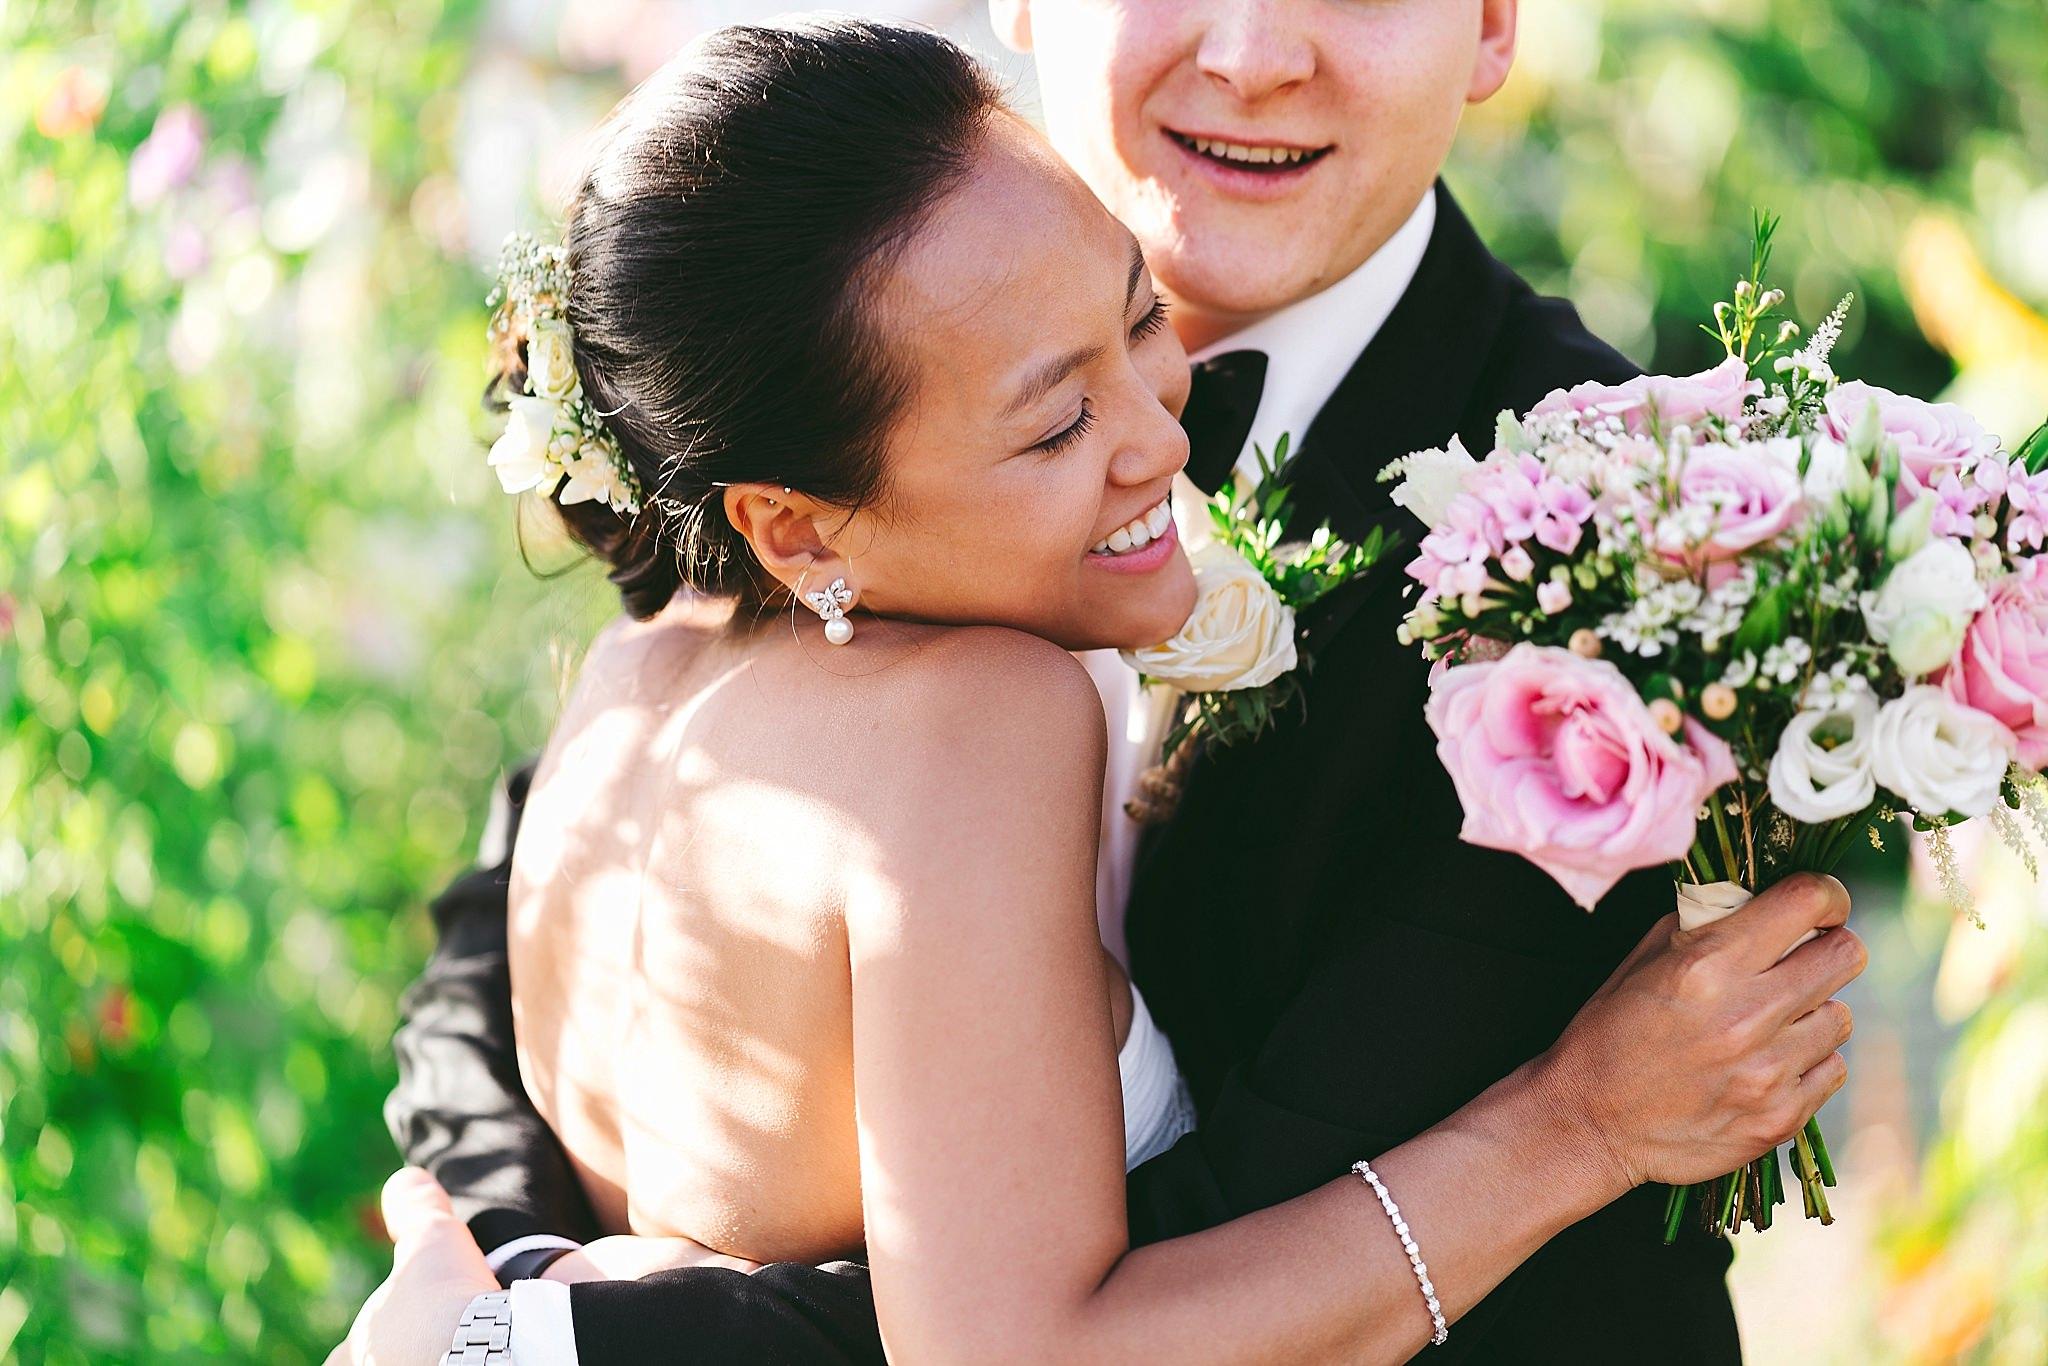 aga-tomaszek-wedding-photographer-cardiff-2016_1001